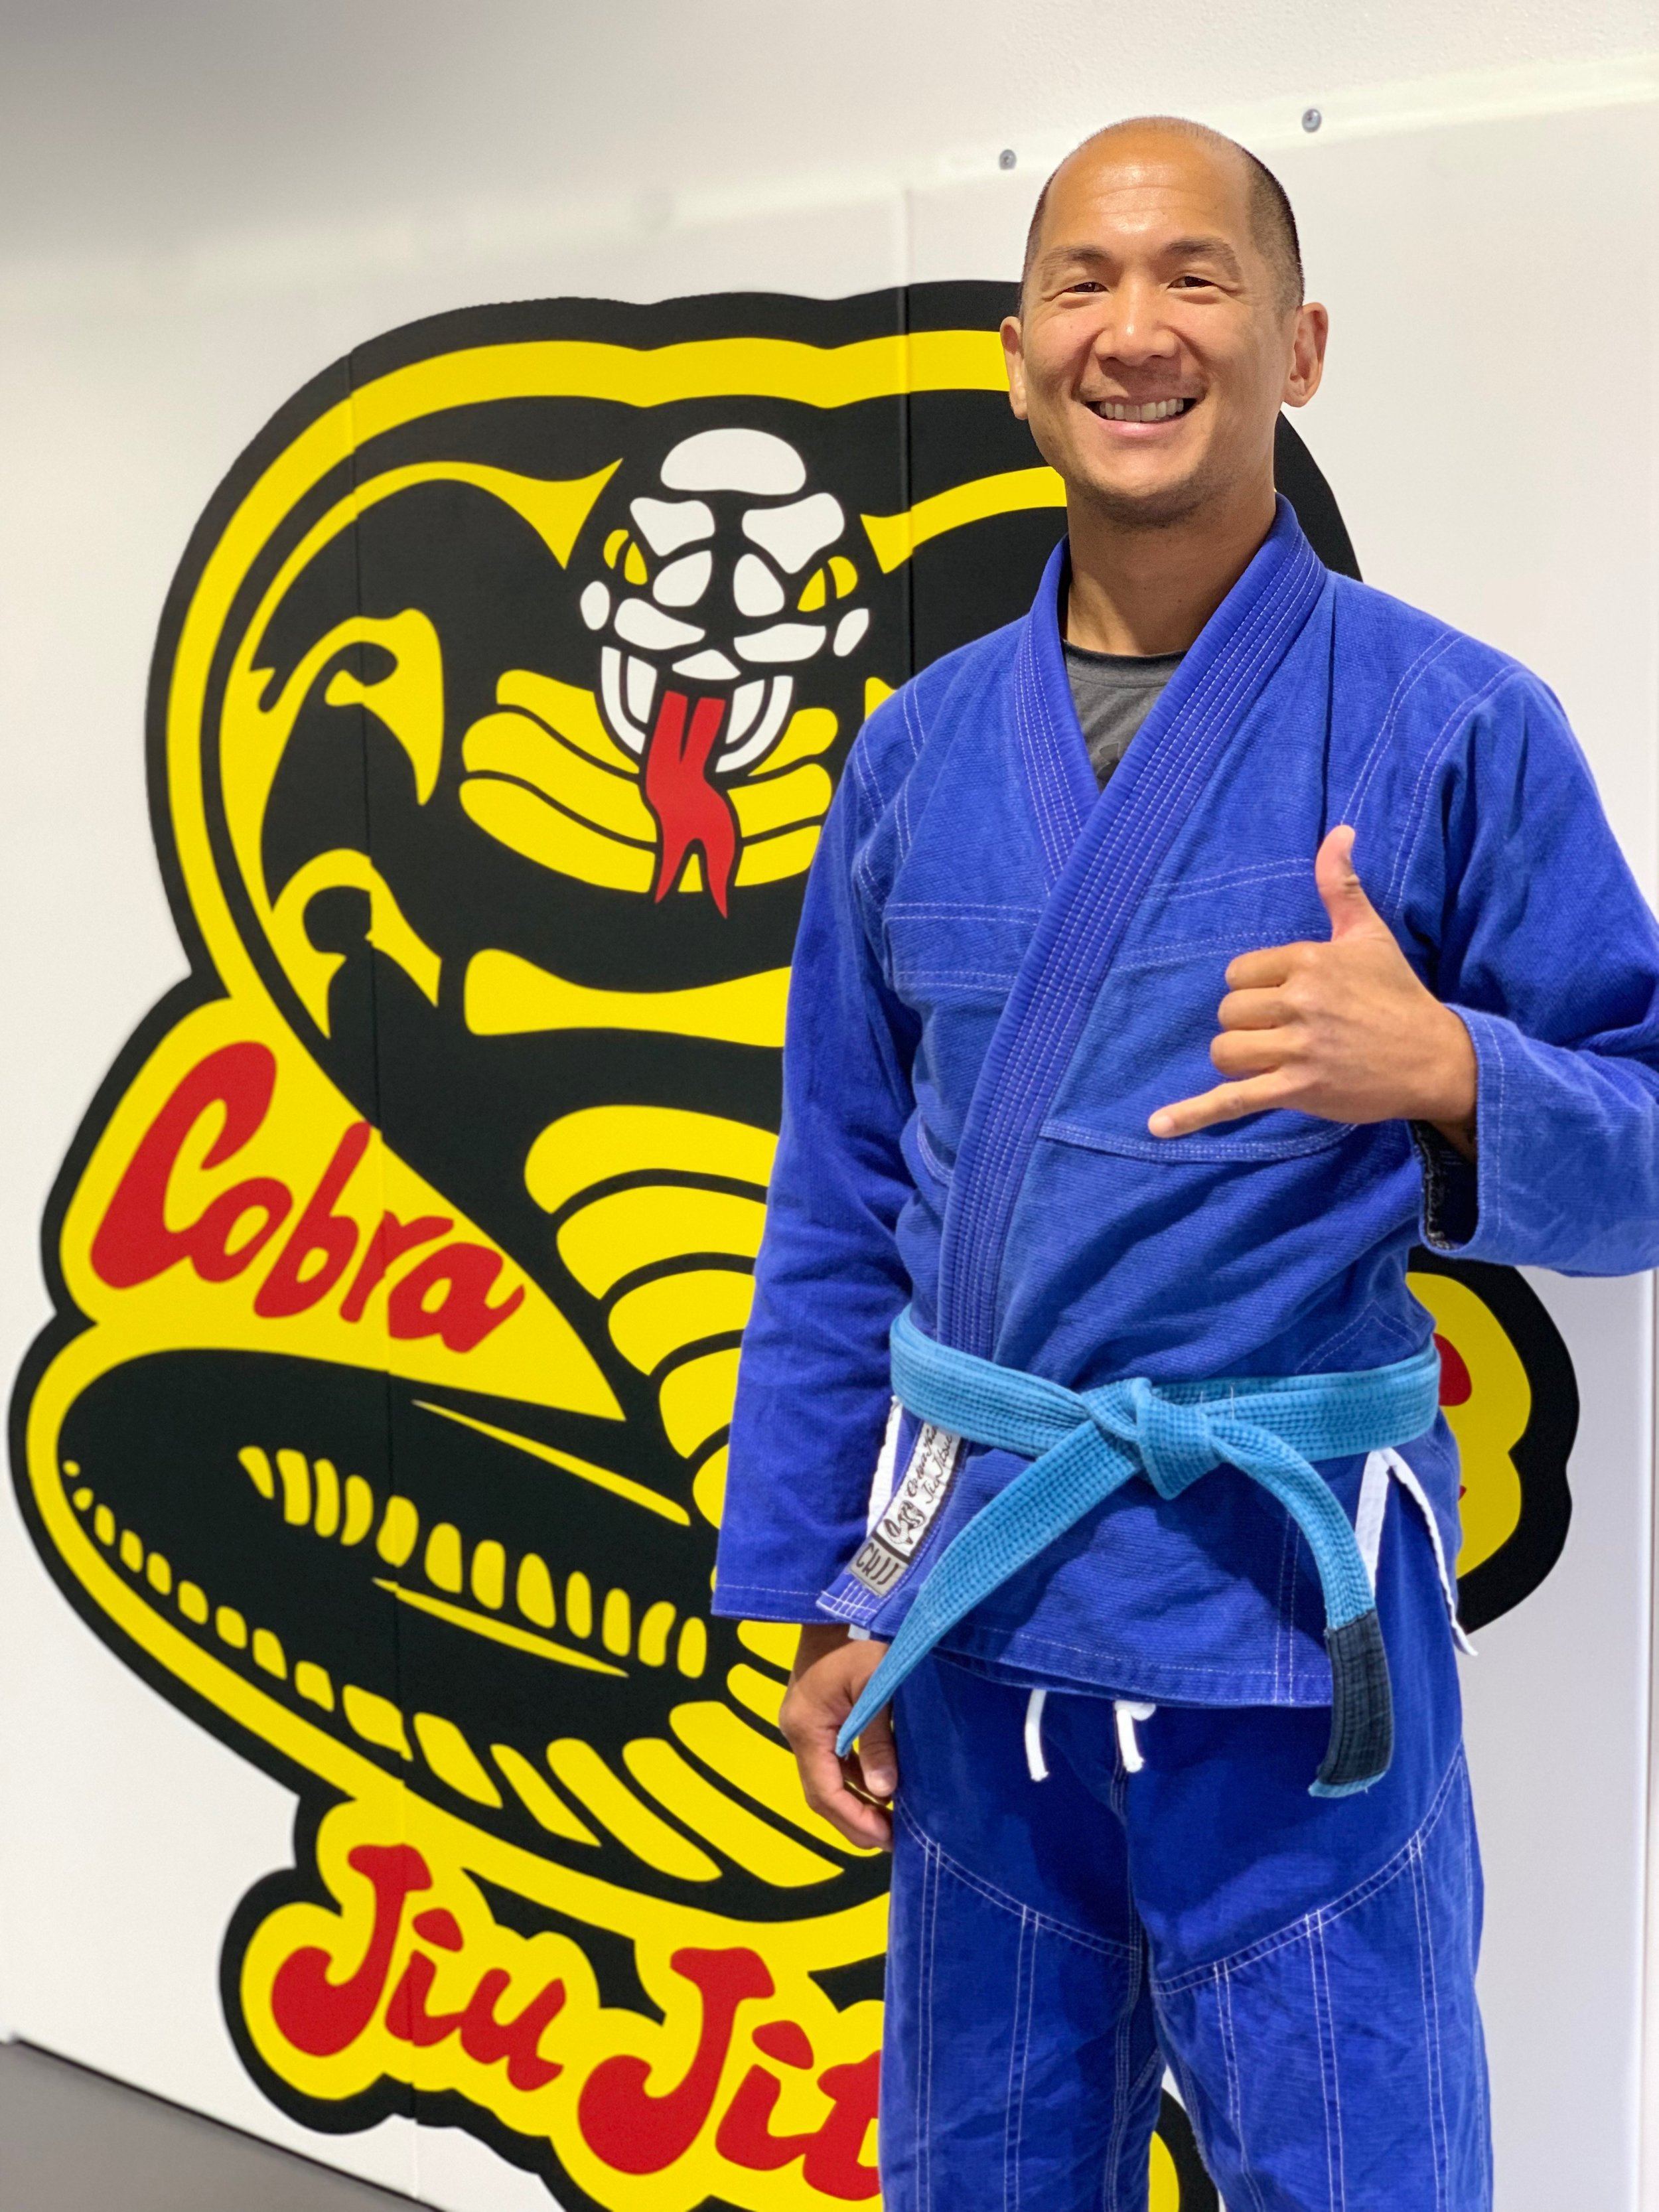 Arthur Hsu  Blue Belt No Gi American Nationals Gold Medalist Pan-Am Bronze Medalist/Master/Blue  No Gi Worlds Silver Medalist/Master/Blue